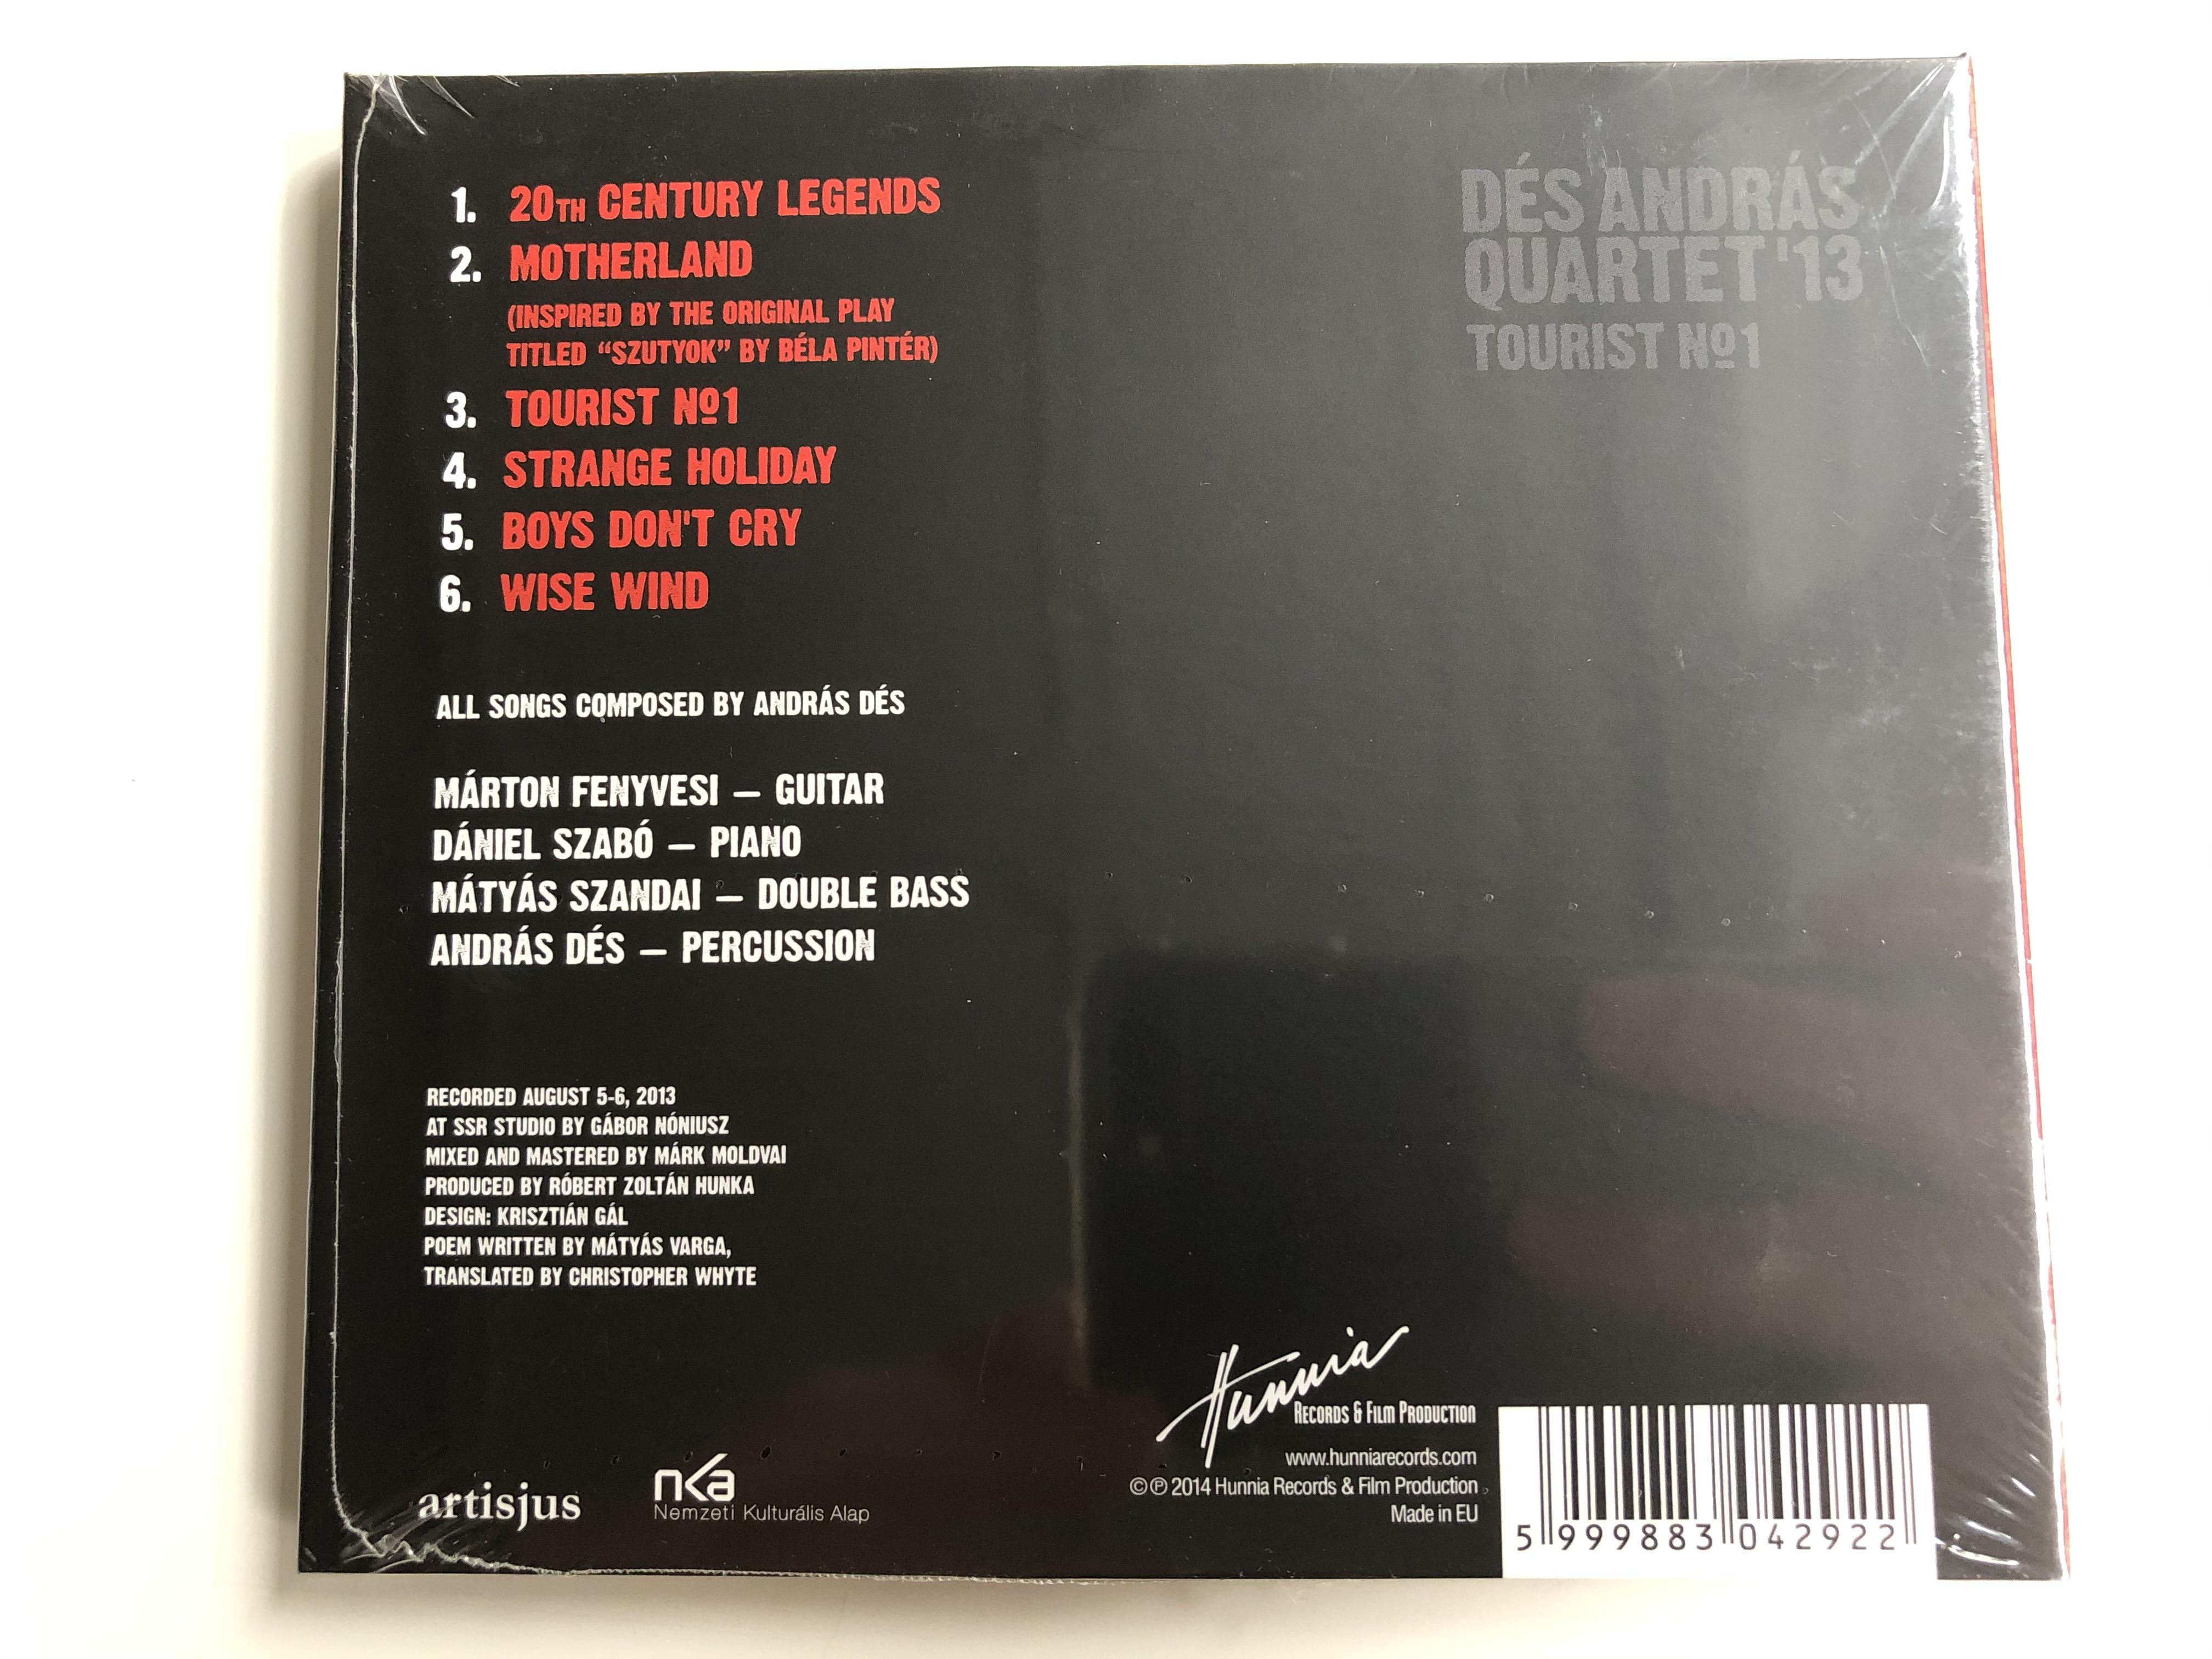 d-s-andr-s-quartet-13-tourist-no.-1-hunnia-records-film-production-audio-cd-2014-hrcd-1401-2-.jpg